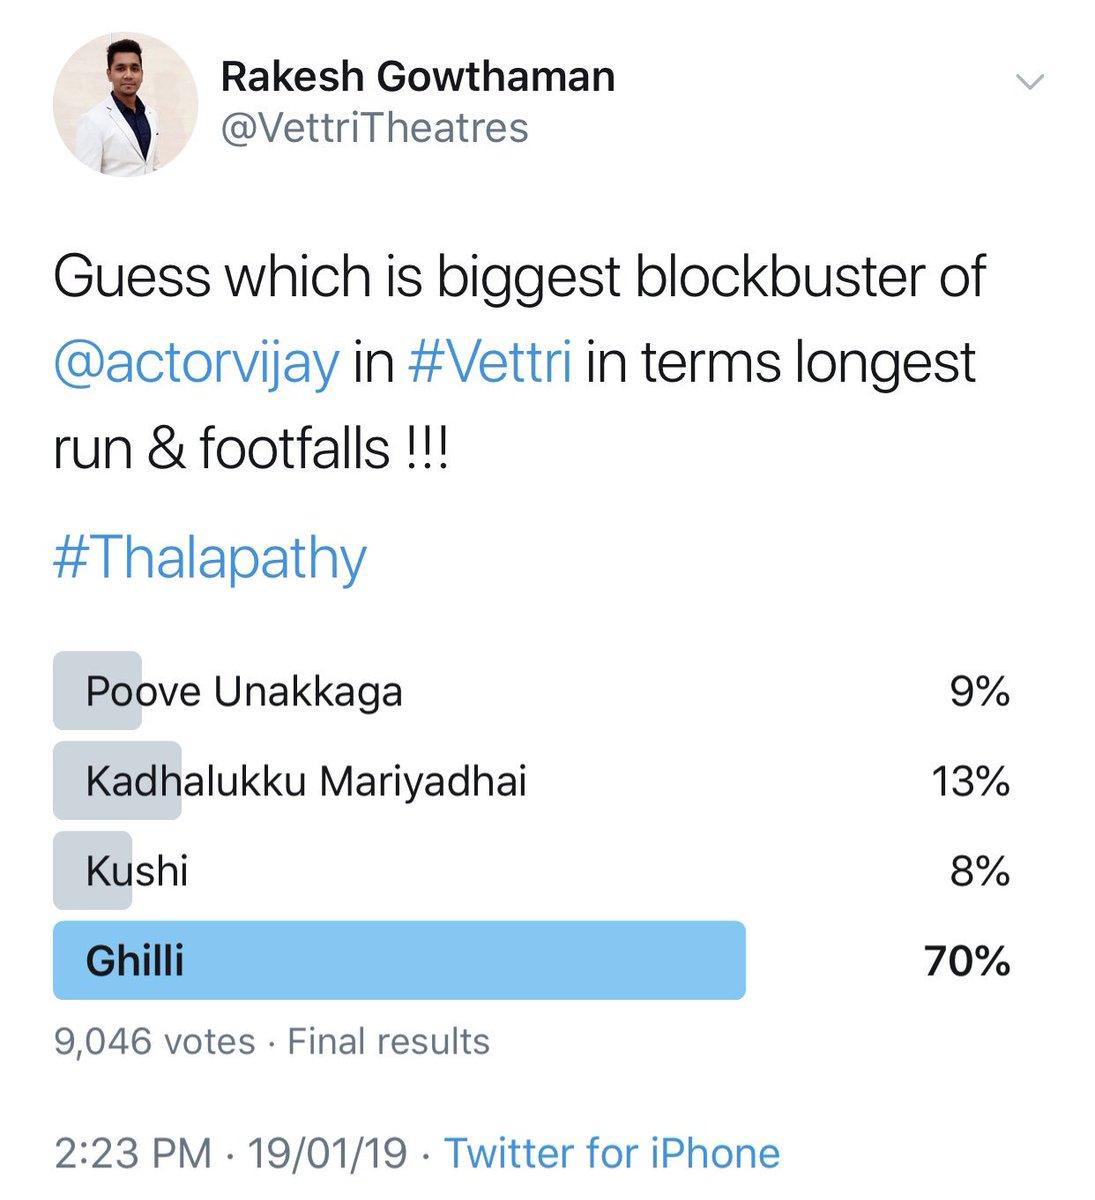 Rakesh Gowthaman on Twitter: